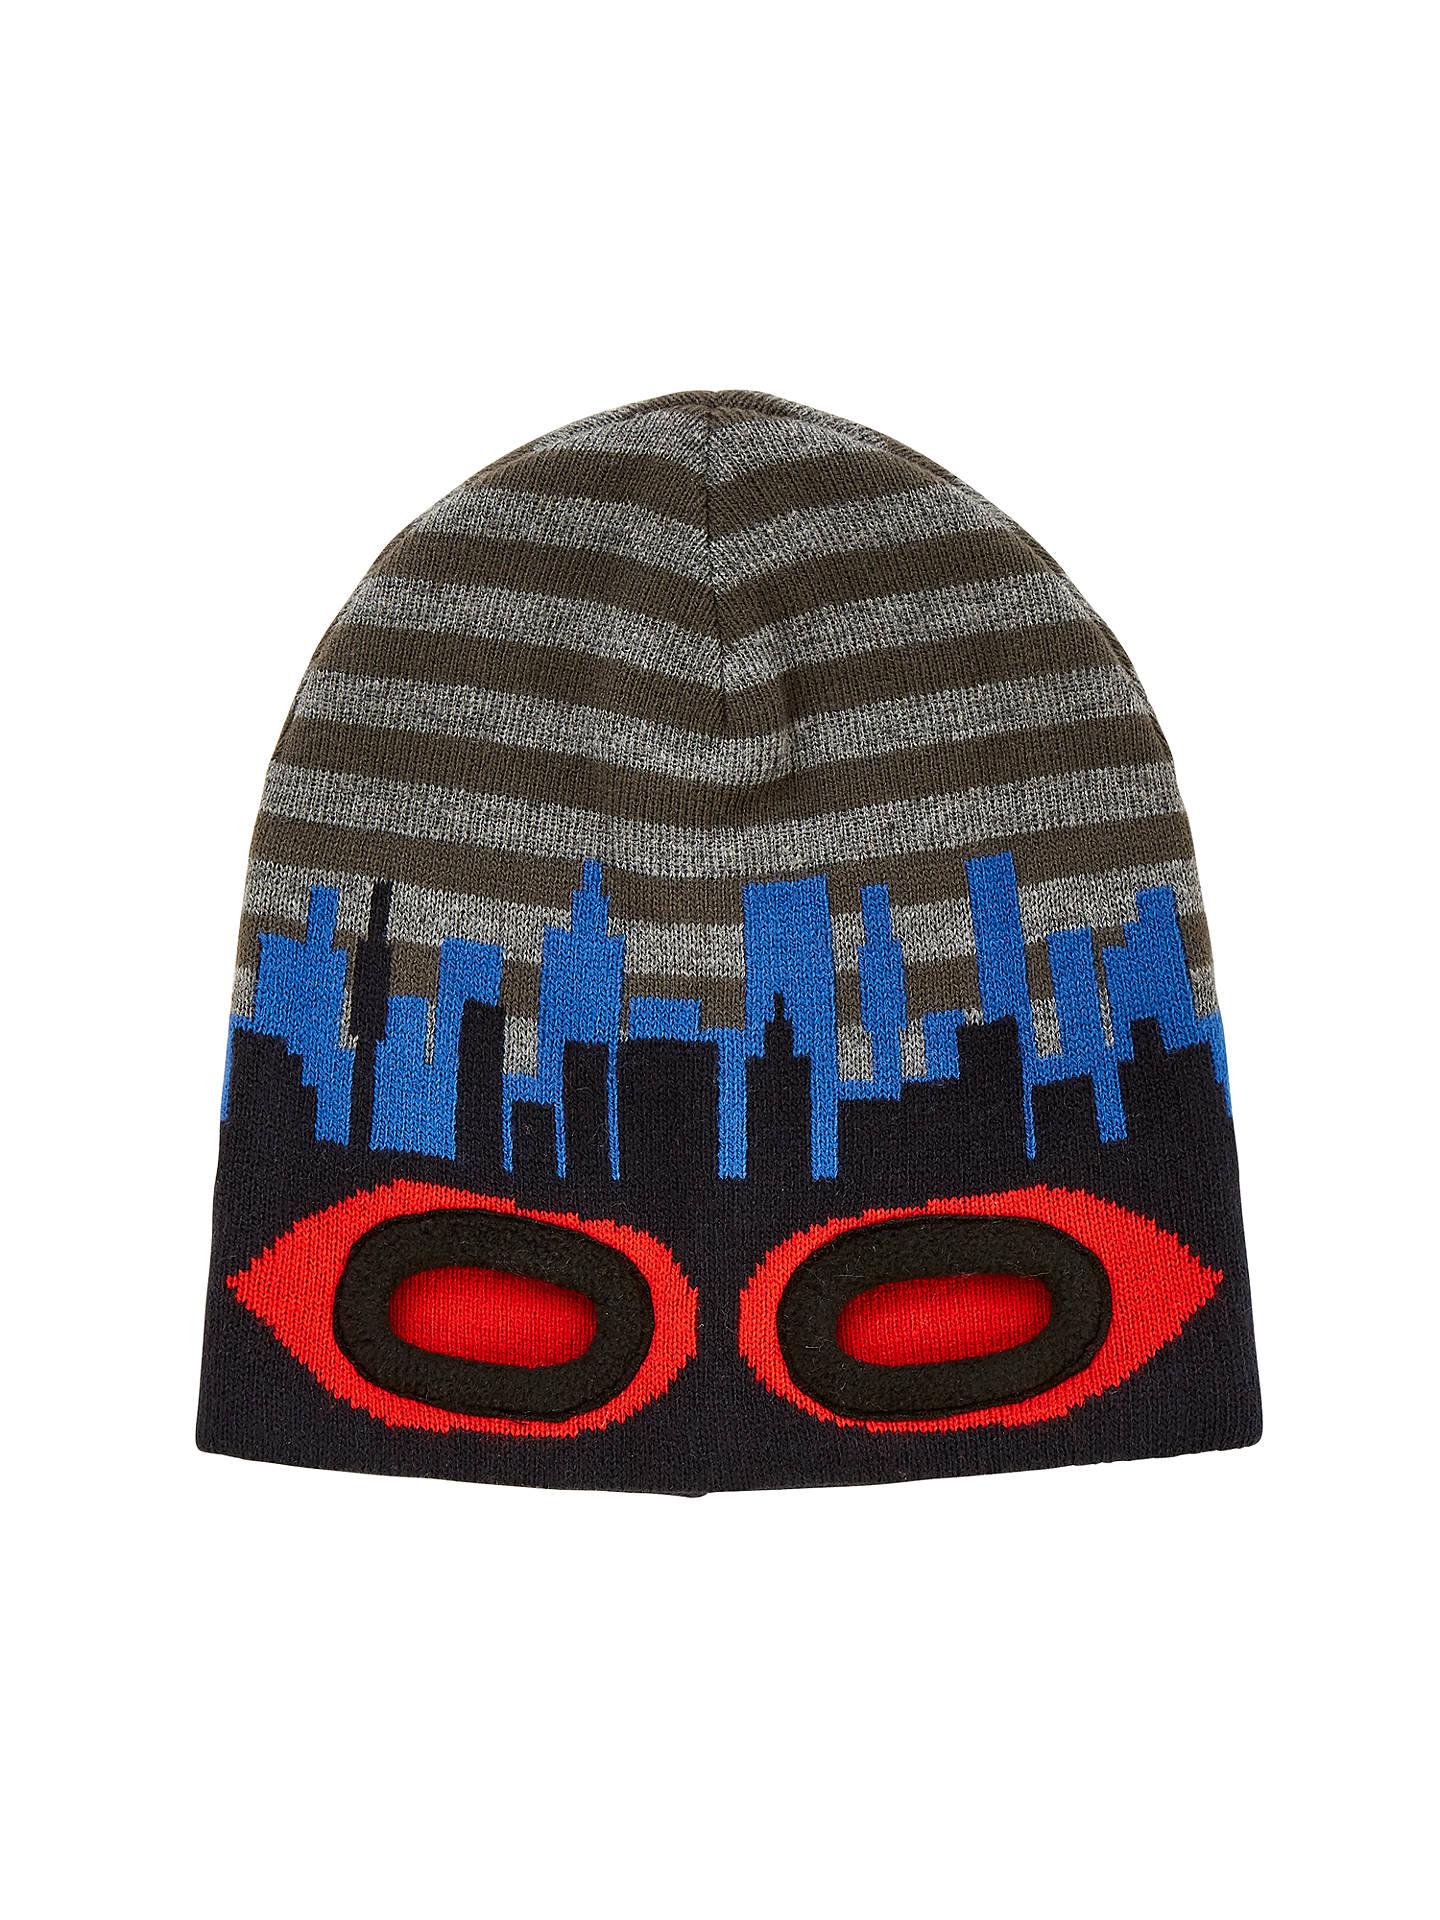 3a1e7454c21 Buy John Lewis Children s Eyehole Beanie Hat